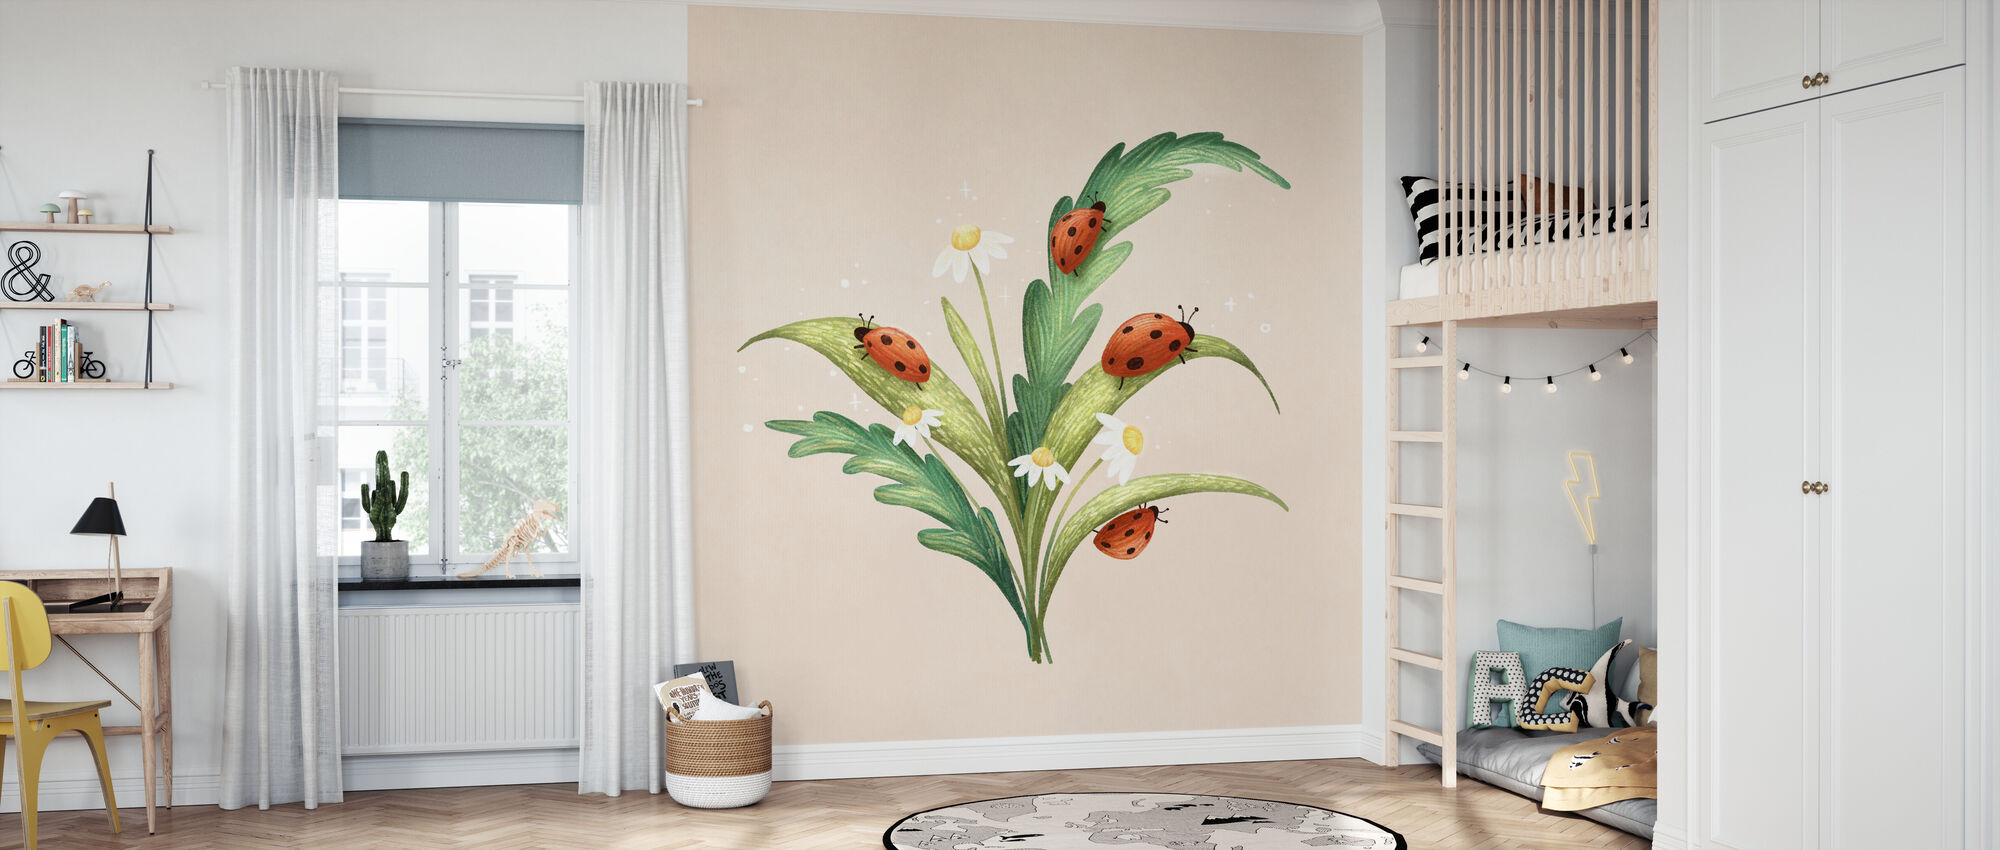 Marienkaefer - Wallpaper - Kids Room